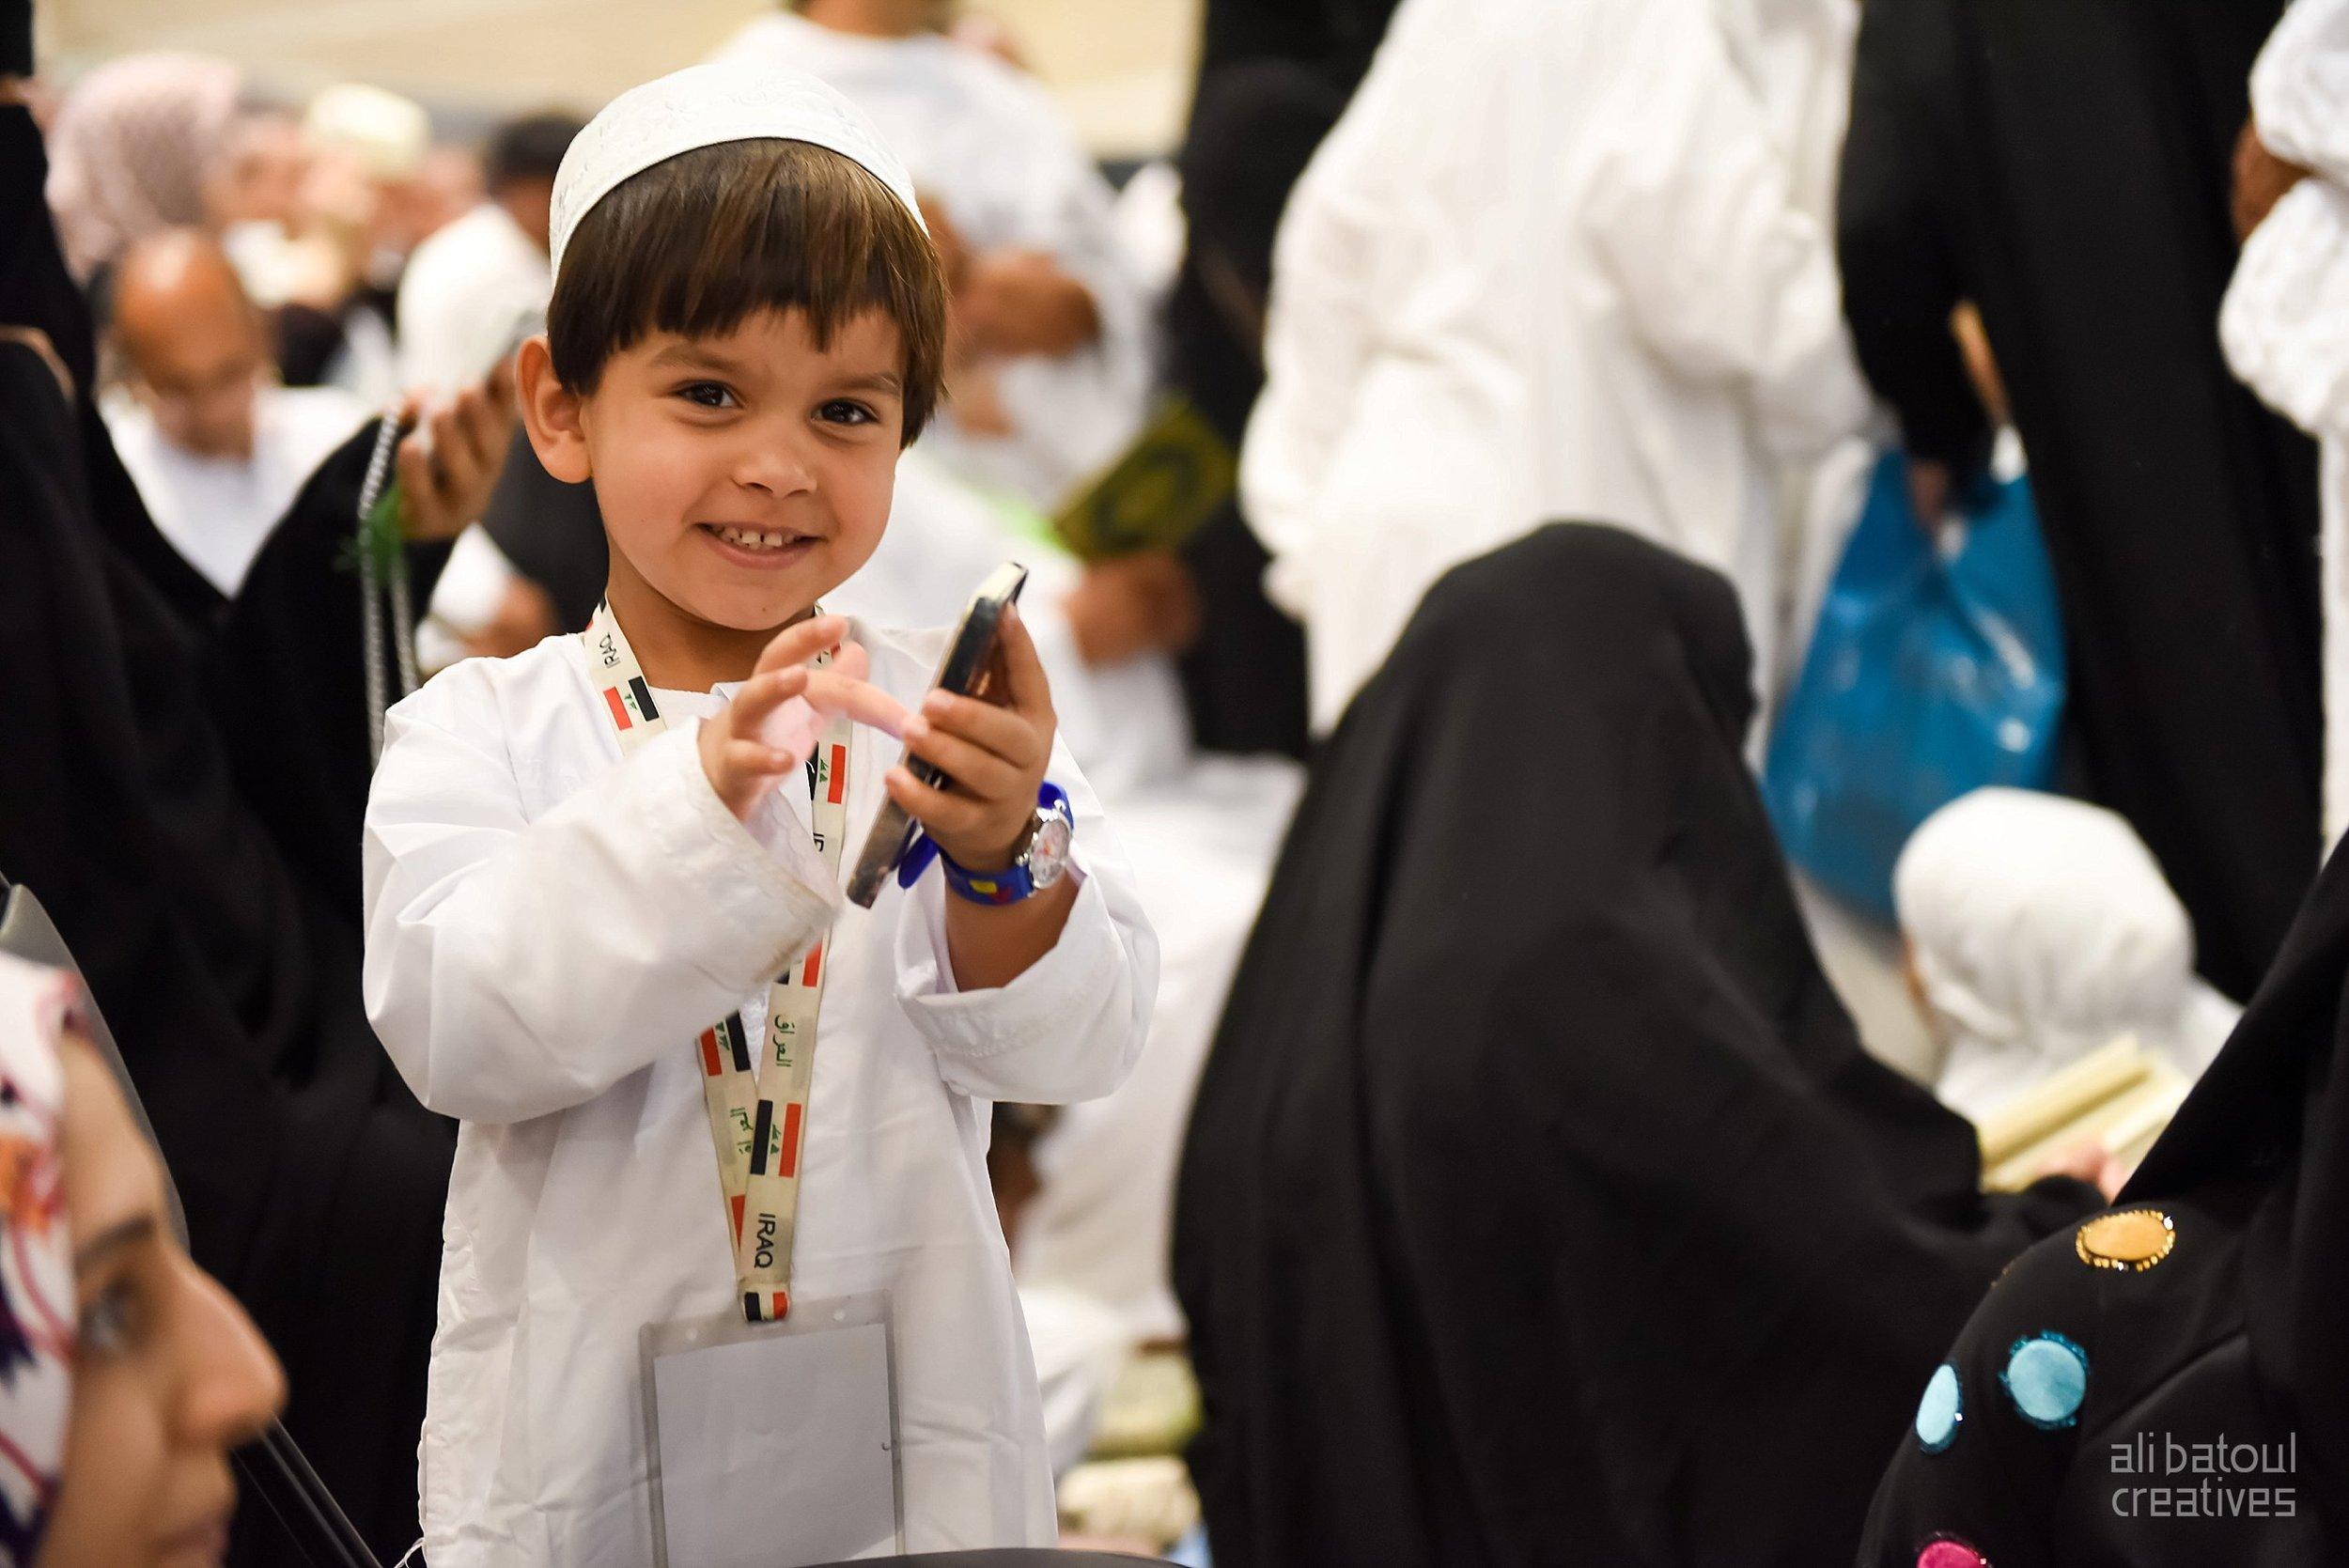 Umrah 2015 (Mecca) - Ali Batoul Creatives-10_Stomped.jpg